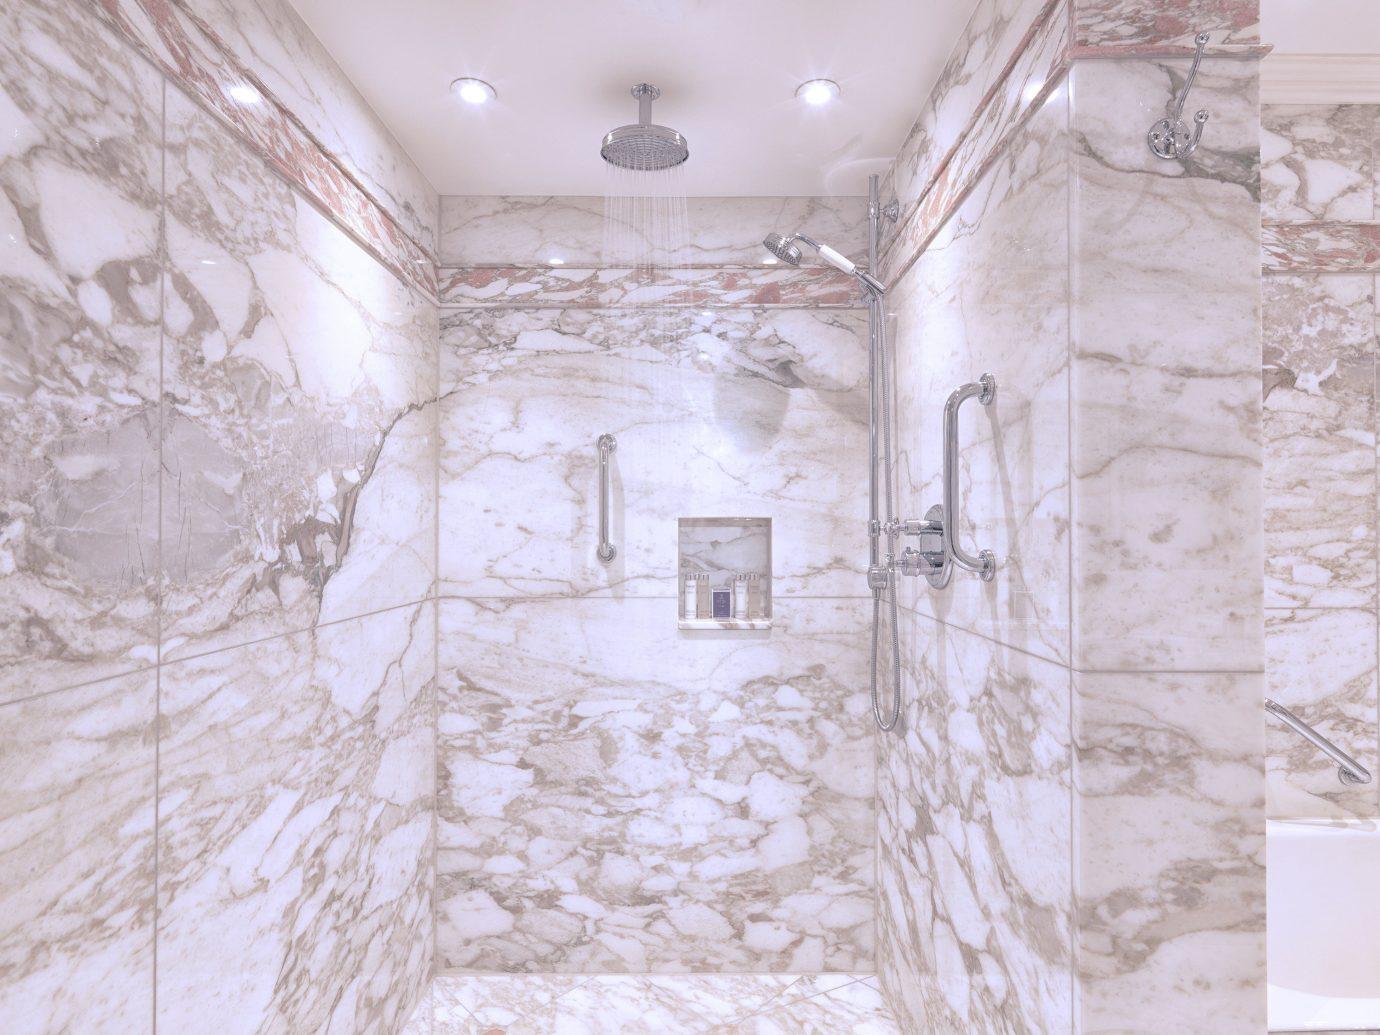 Hotels London Luxury Travel indoor snow wall ceiling floor plaster drawing flooring interior design bathroom